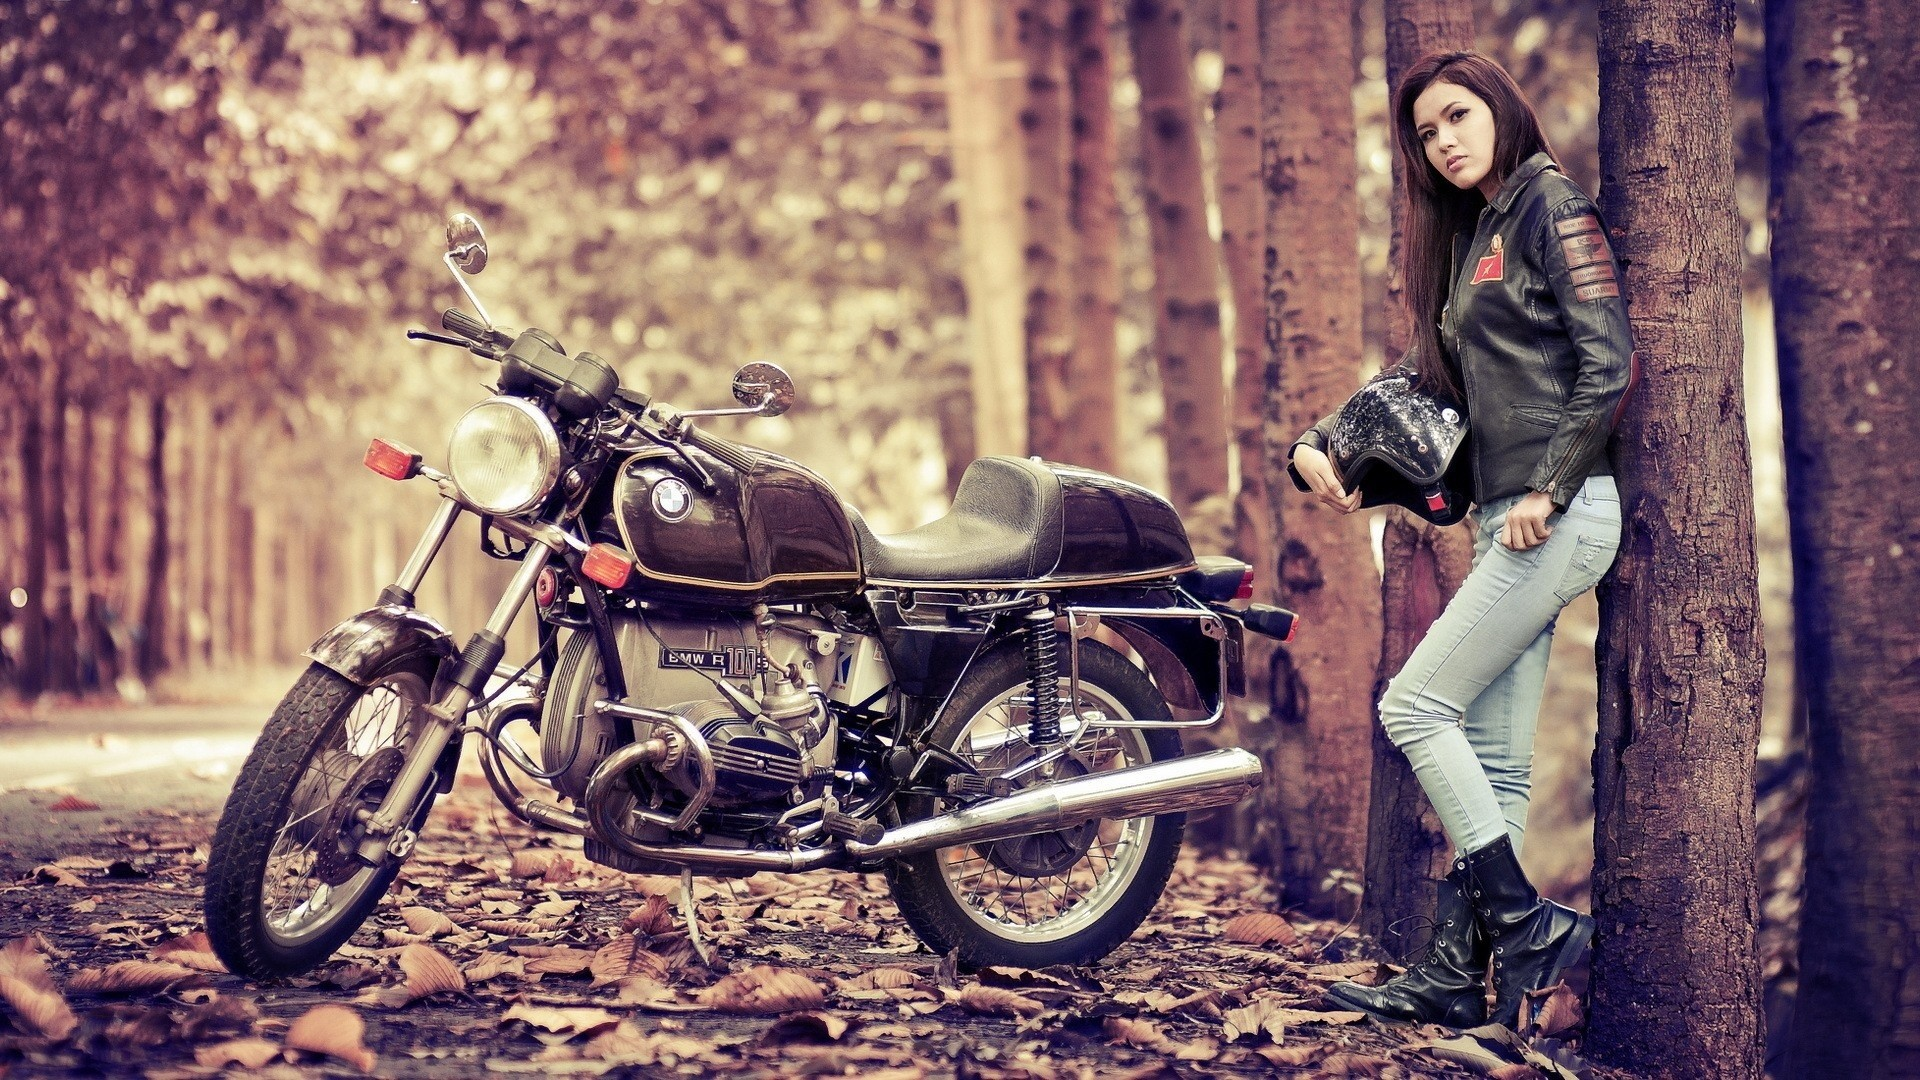 vehicles motorcycles bikes roads autumn fall leaves women females girls  models brunttes wallpaper